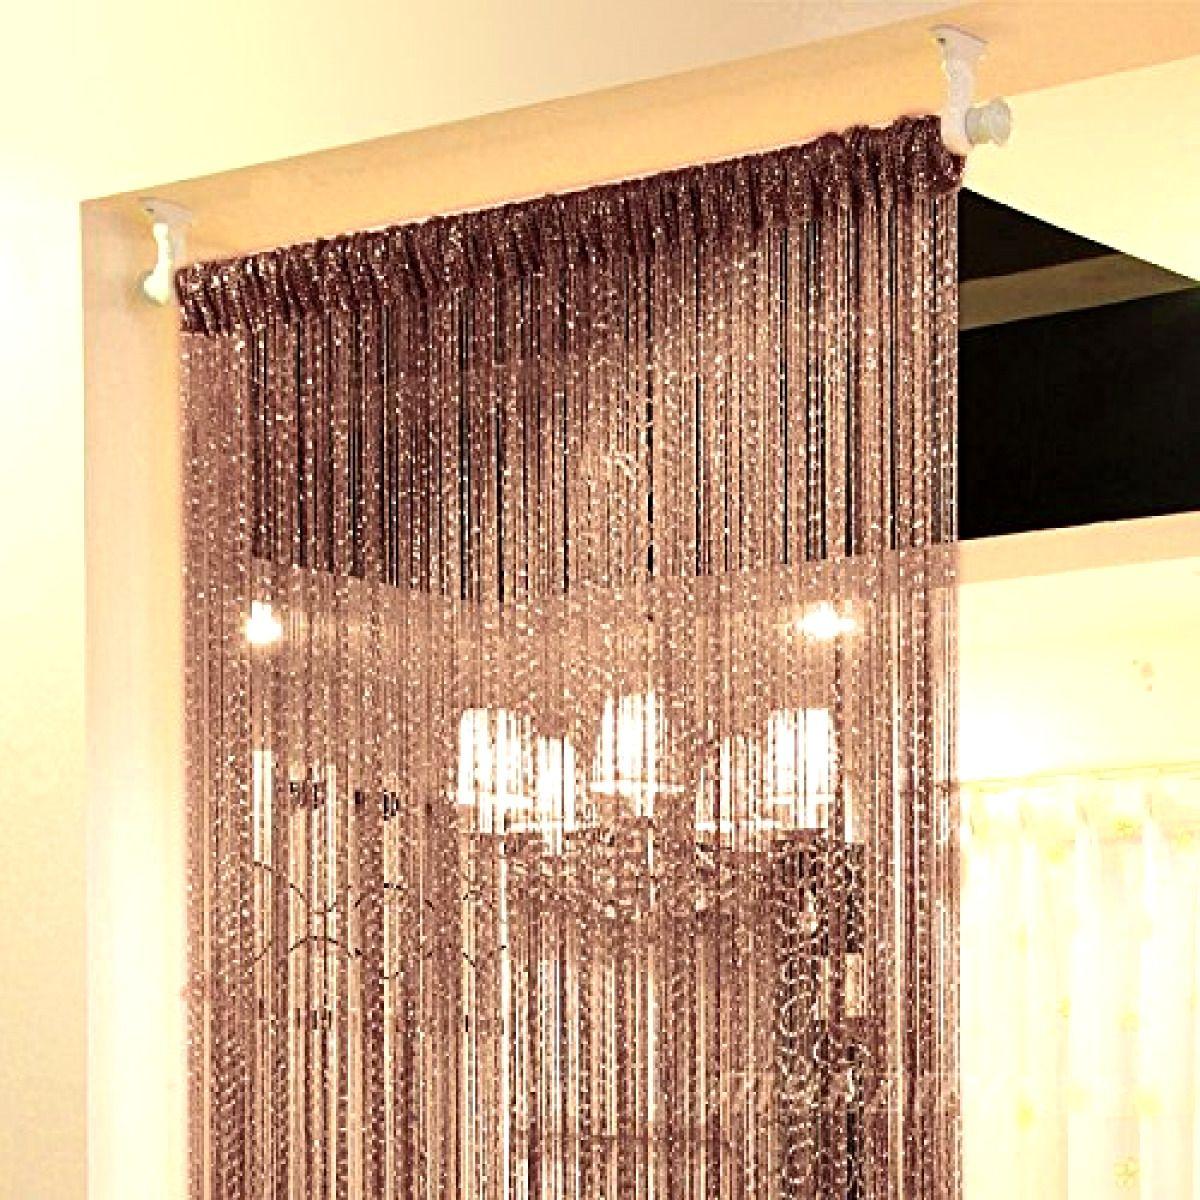 14Colors String Door Curtain Beads Room Divider Window Panel Tassel Fringe Decor